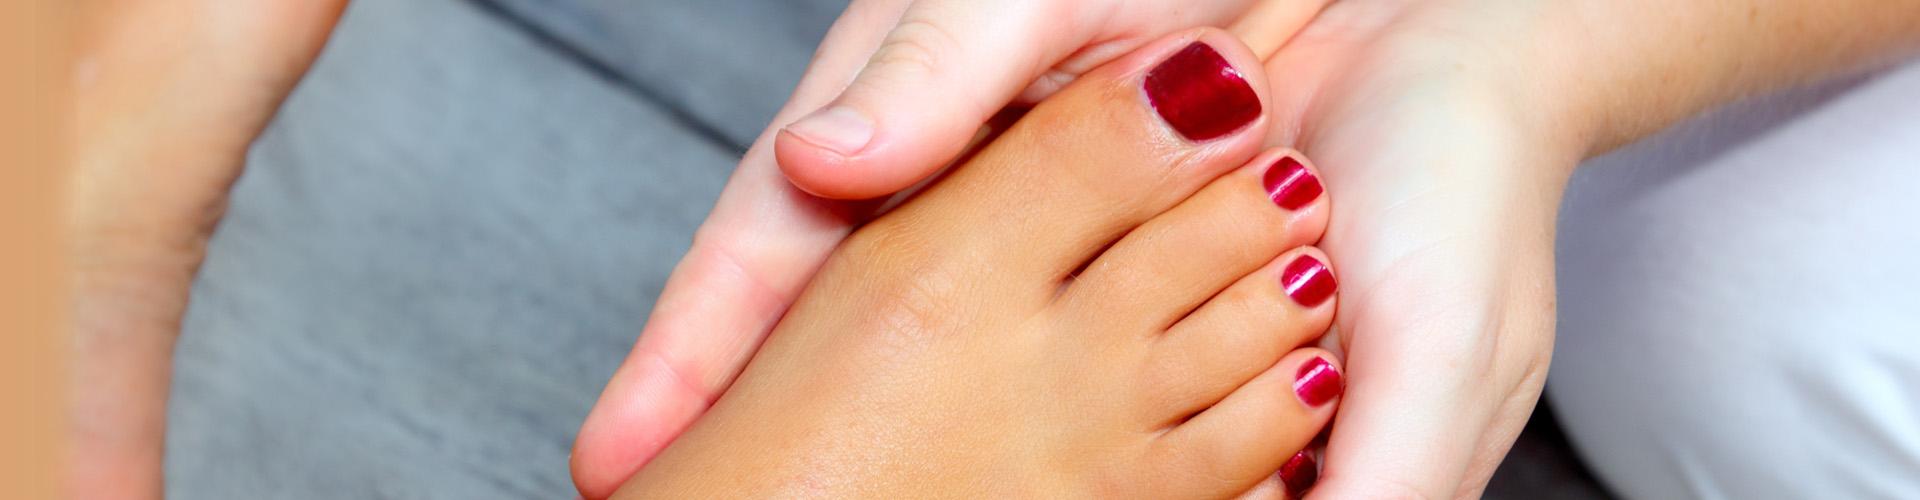 ortopedia examen del pie diabetes